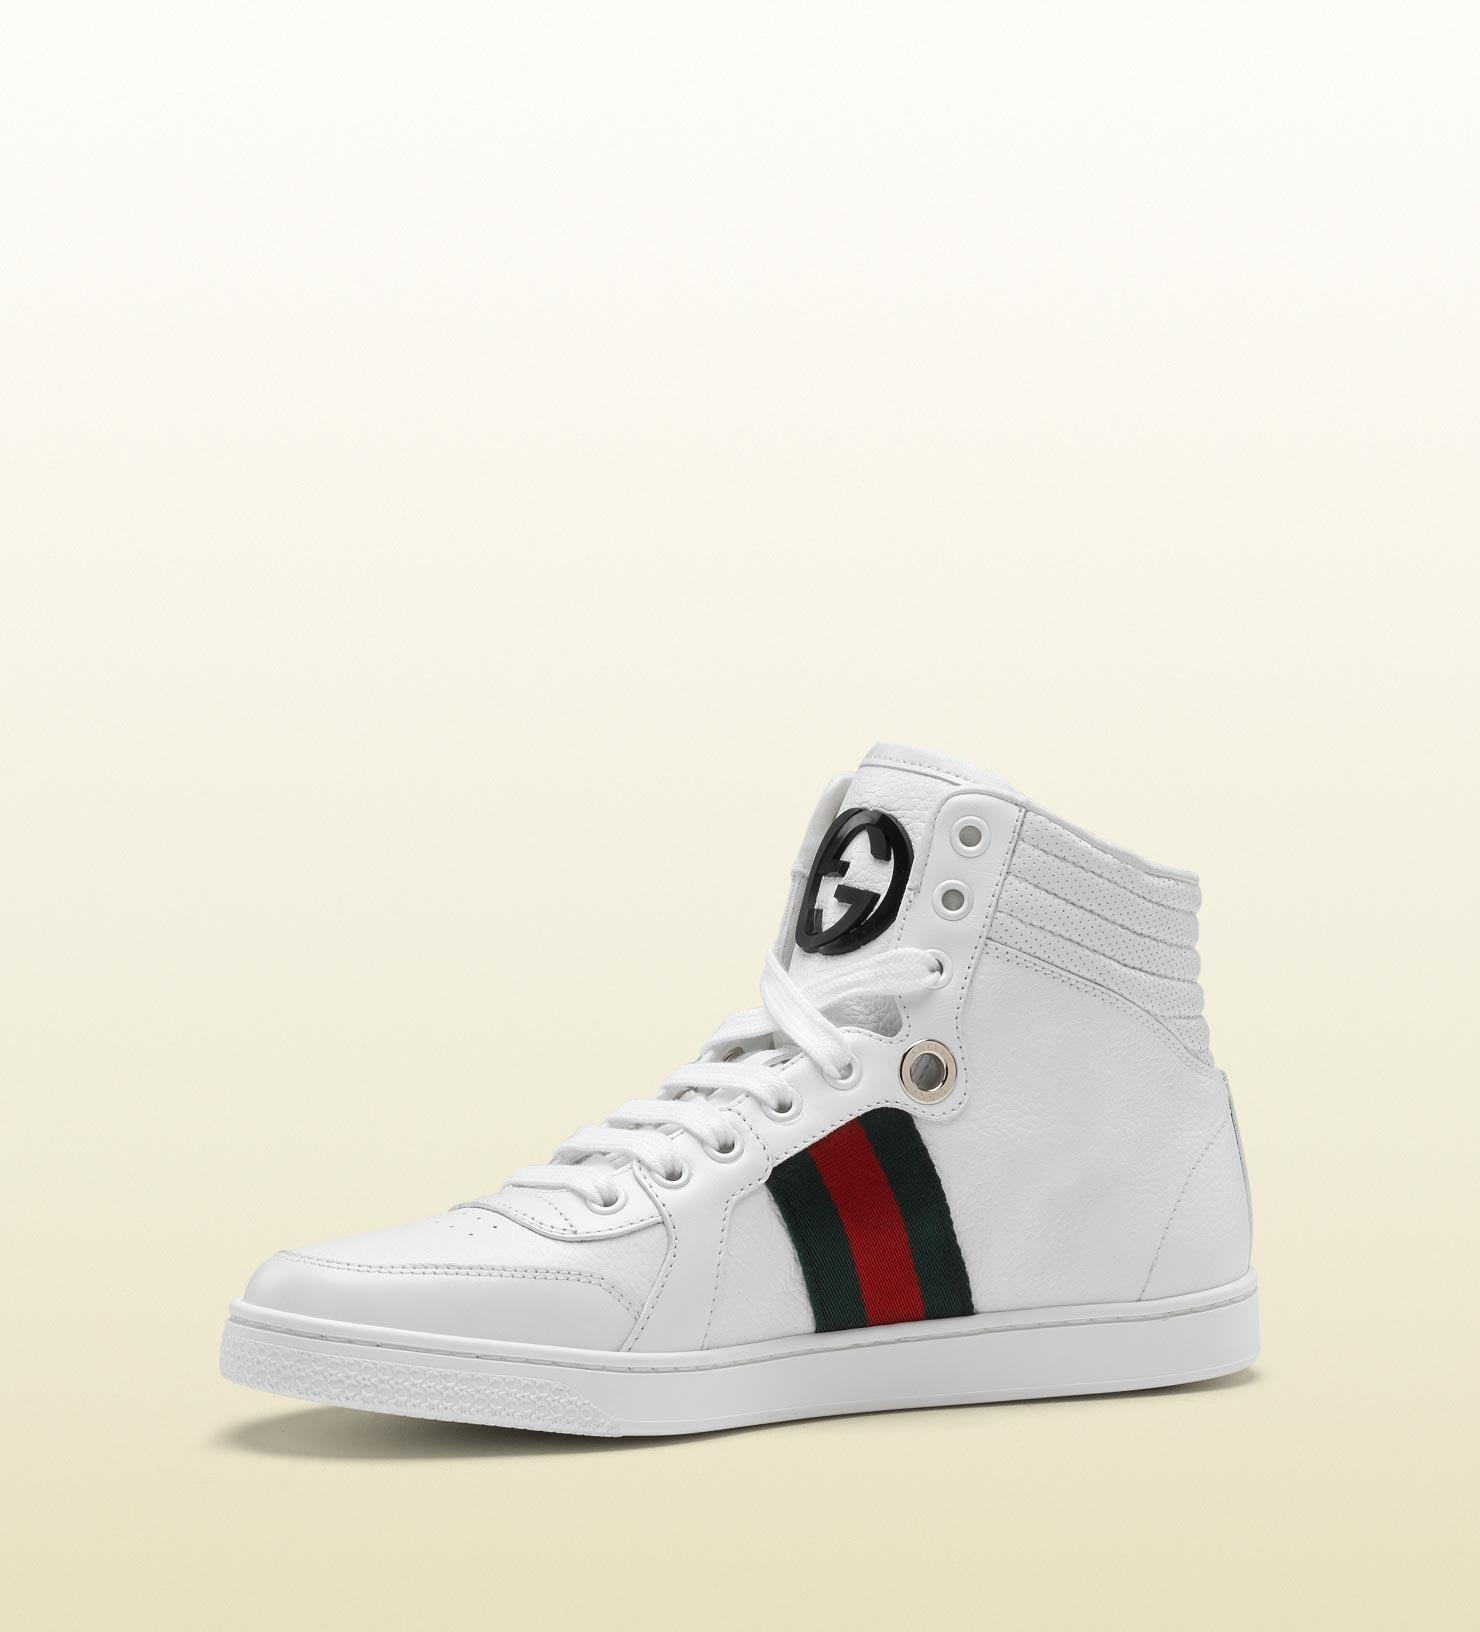 cb4243fab46 Lyst - Gucci Coda Hi-top Sneaker With Interlocking G And Signature ...